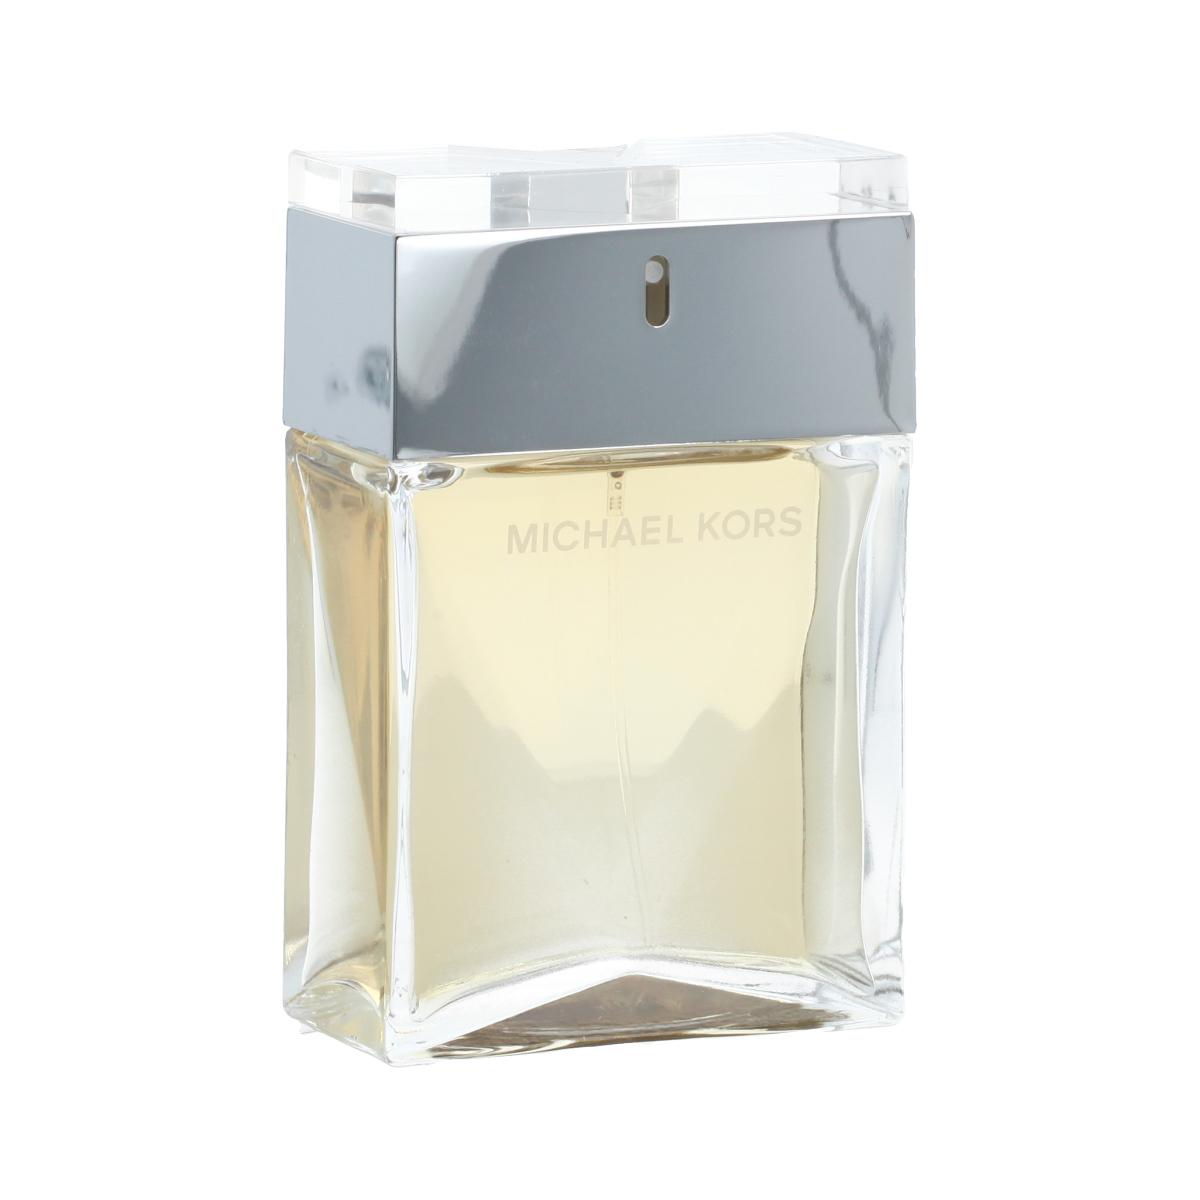 Michael Kors Michael Kors Eau De Parfum 100 ml (woman) 75853